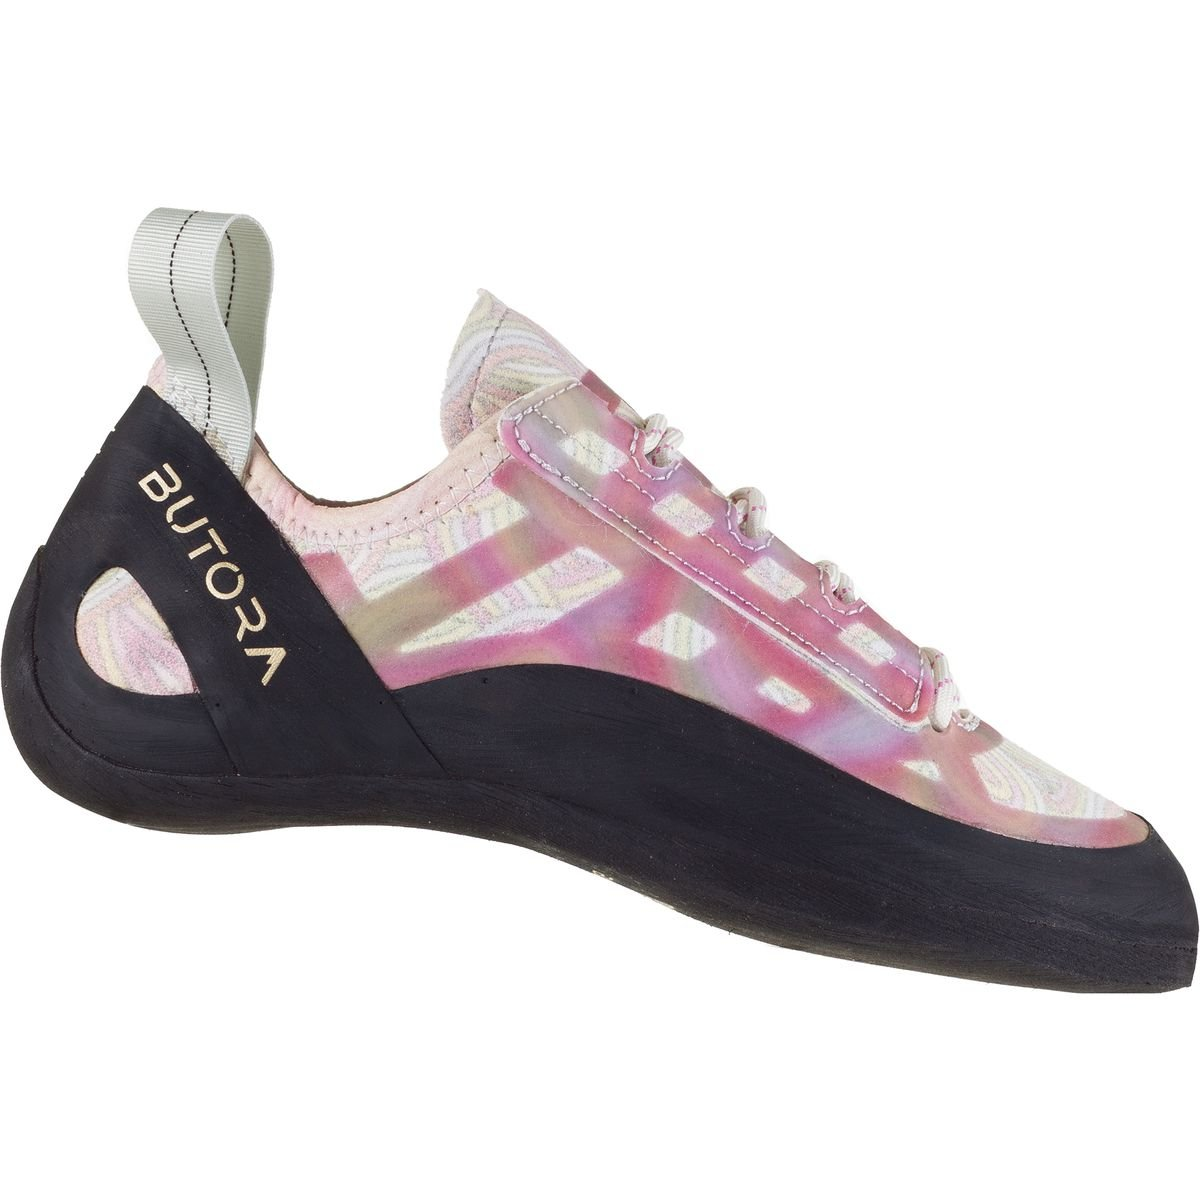 Butora Libra Tight Fit Climbing Shoe - Women's Print 8.5